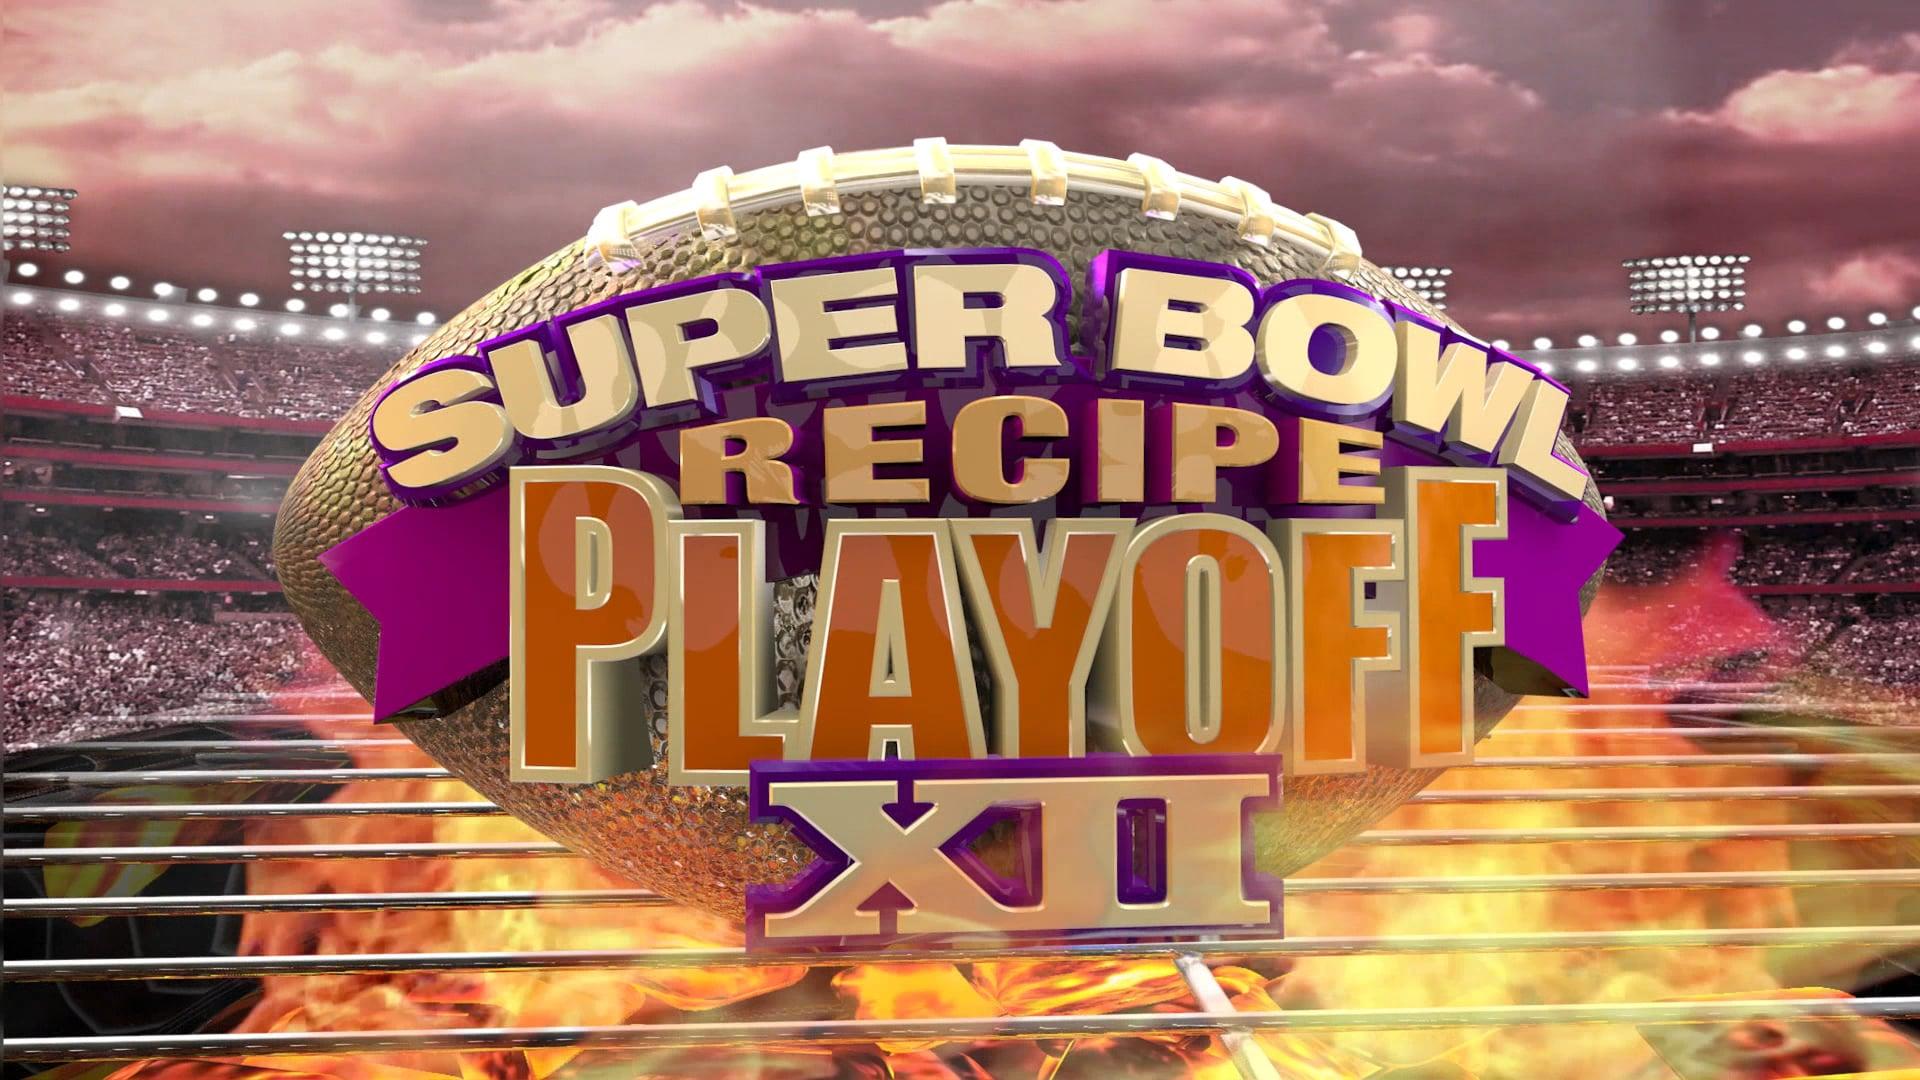 Superbowl Recipe Playoff